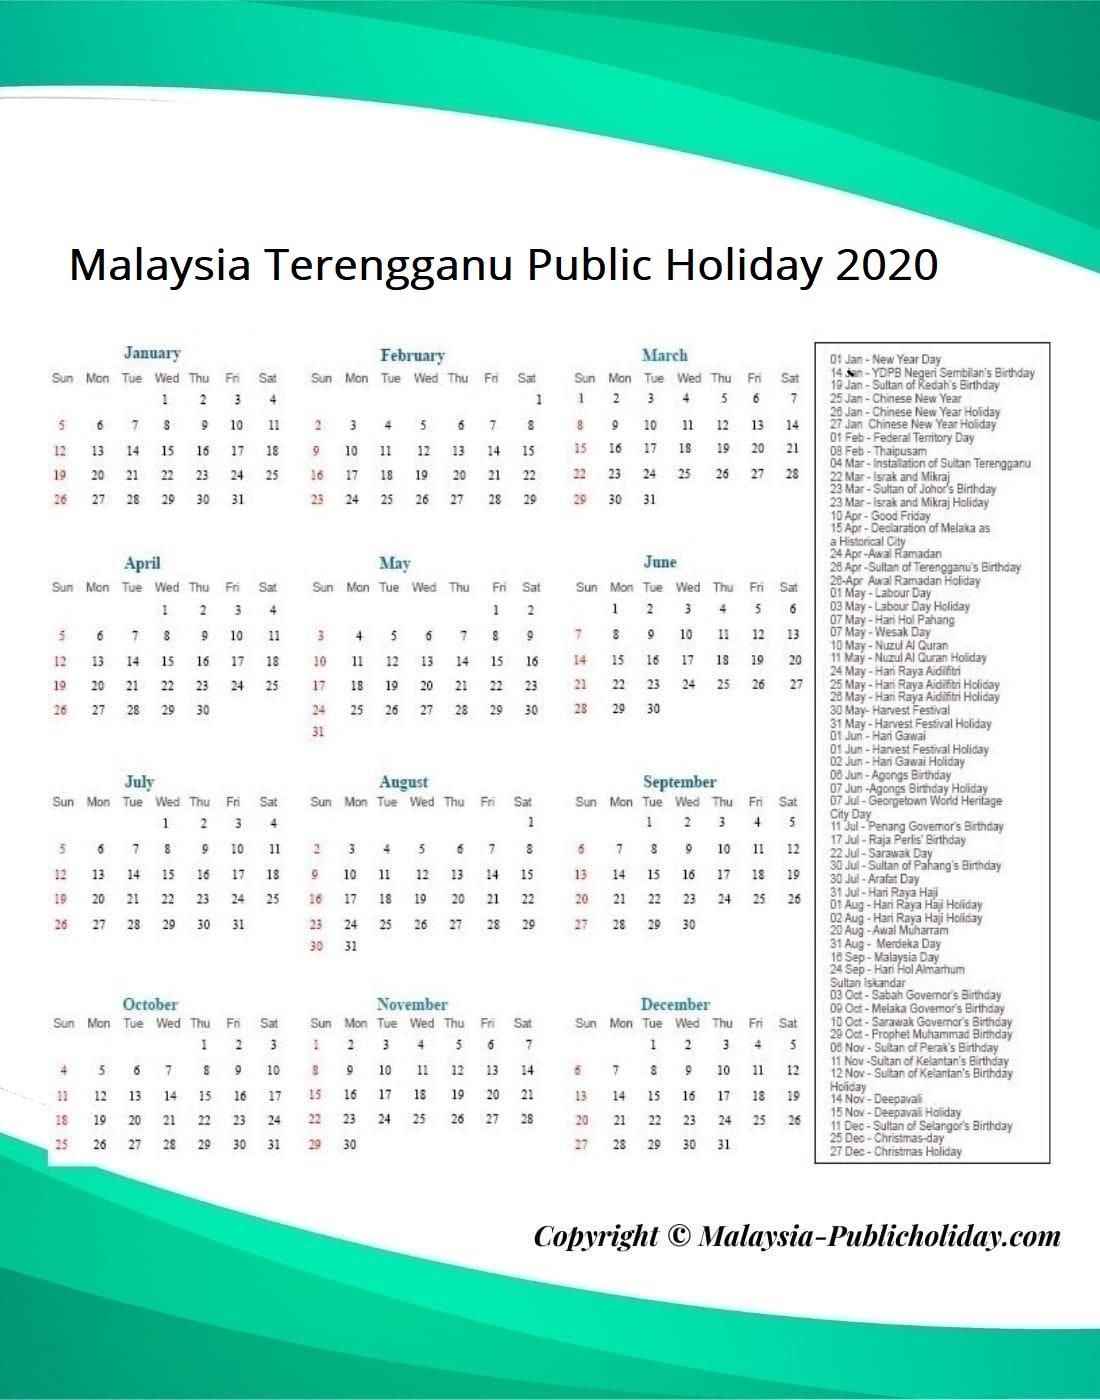 Terengganu Public Holiday 2020